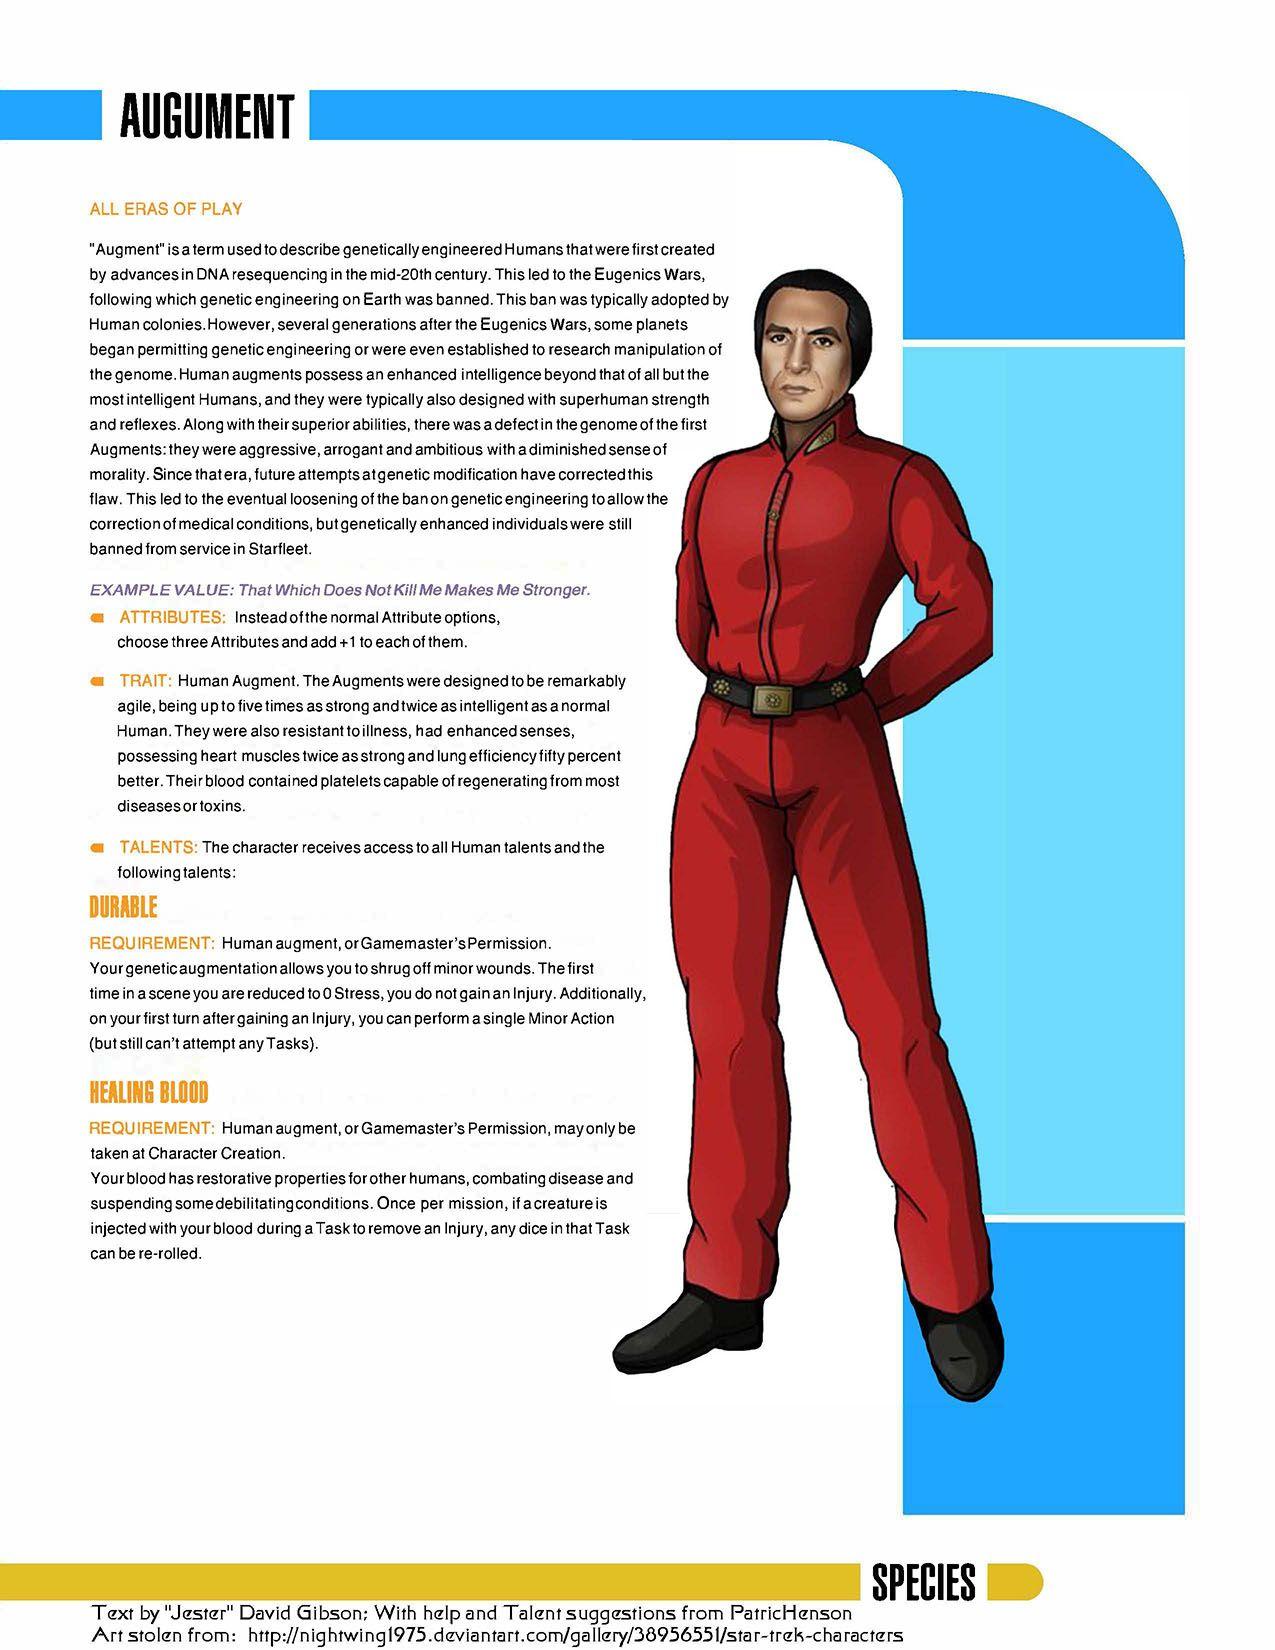 Ten Forward Fridays Human Augment Star Trek Species Star Trek Universe Star Trek Characters